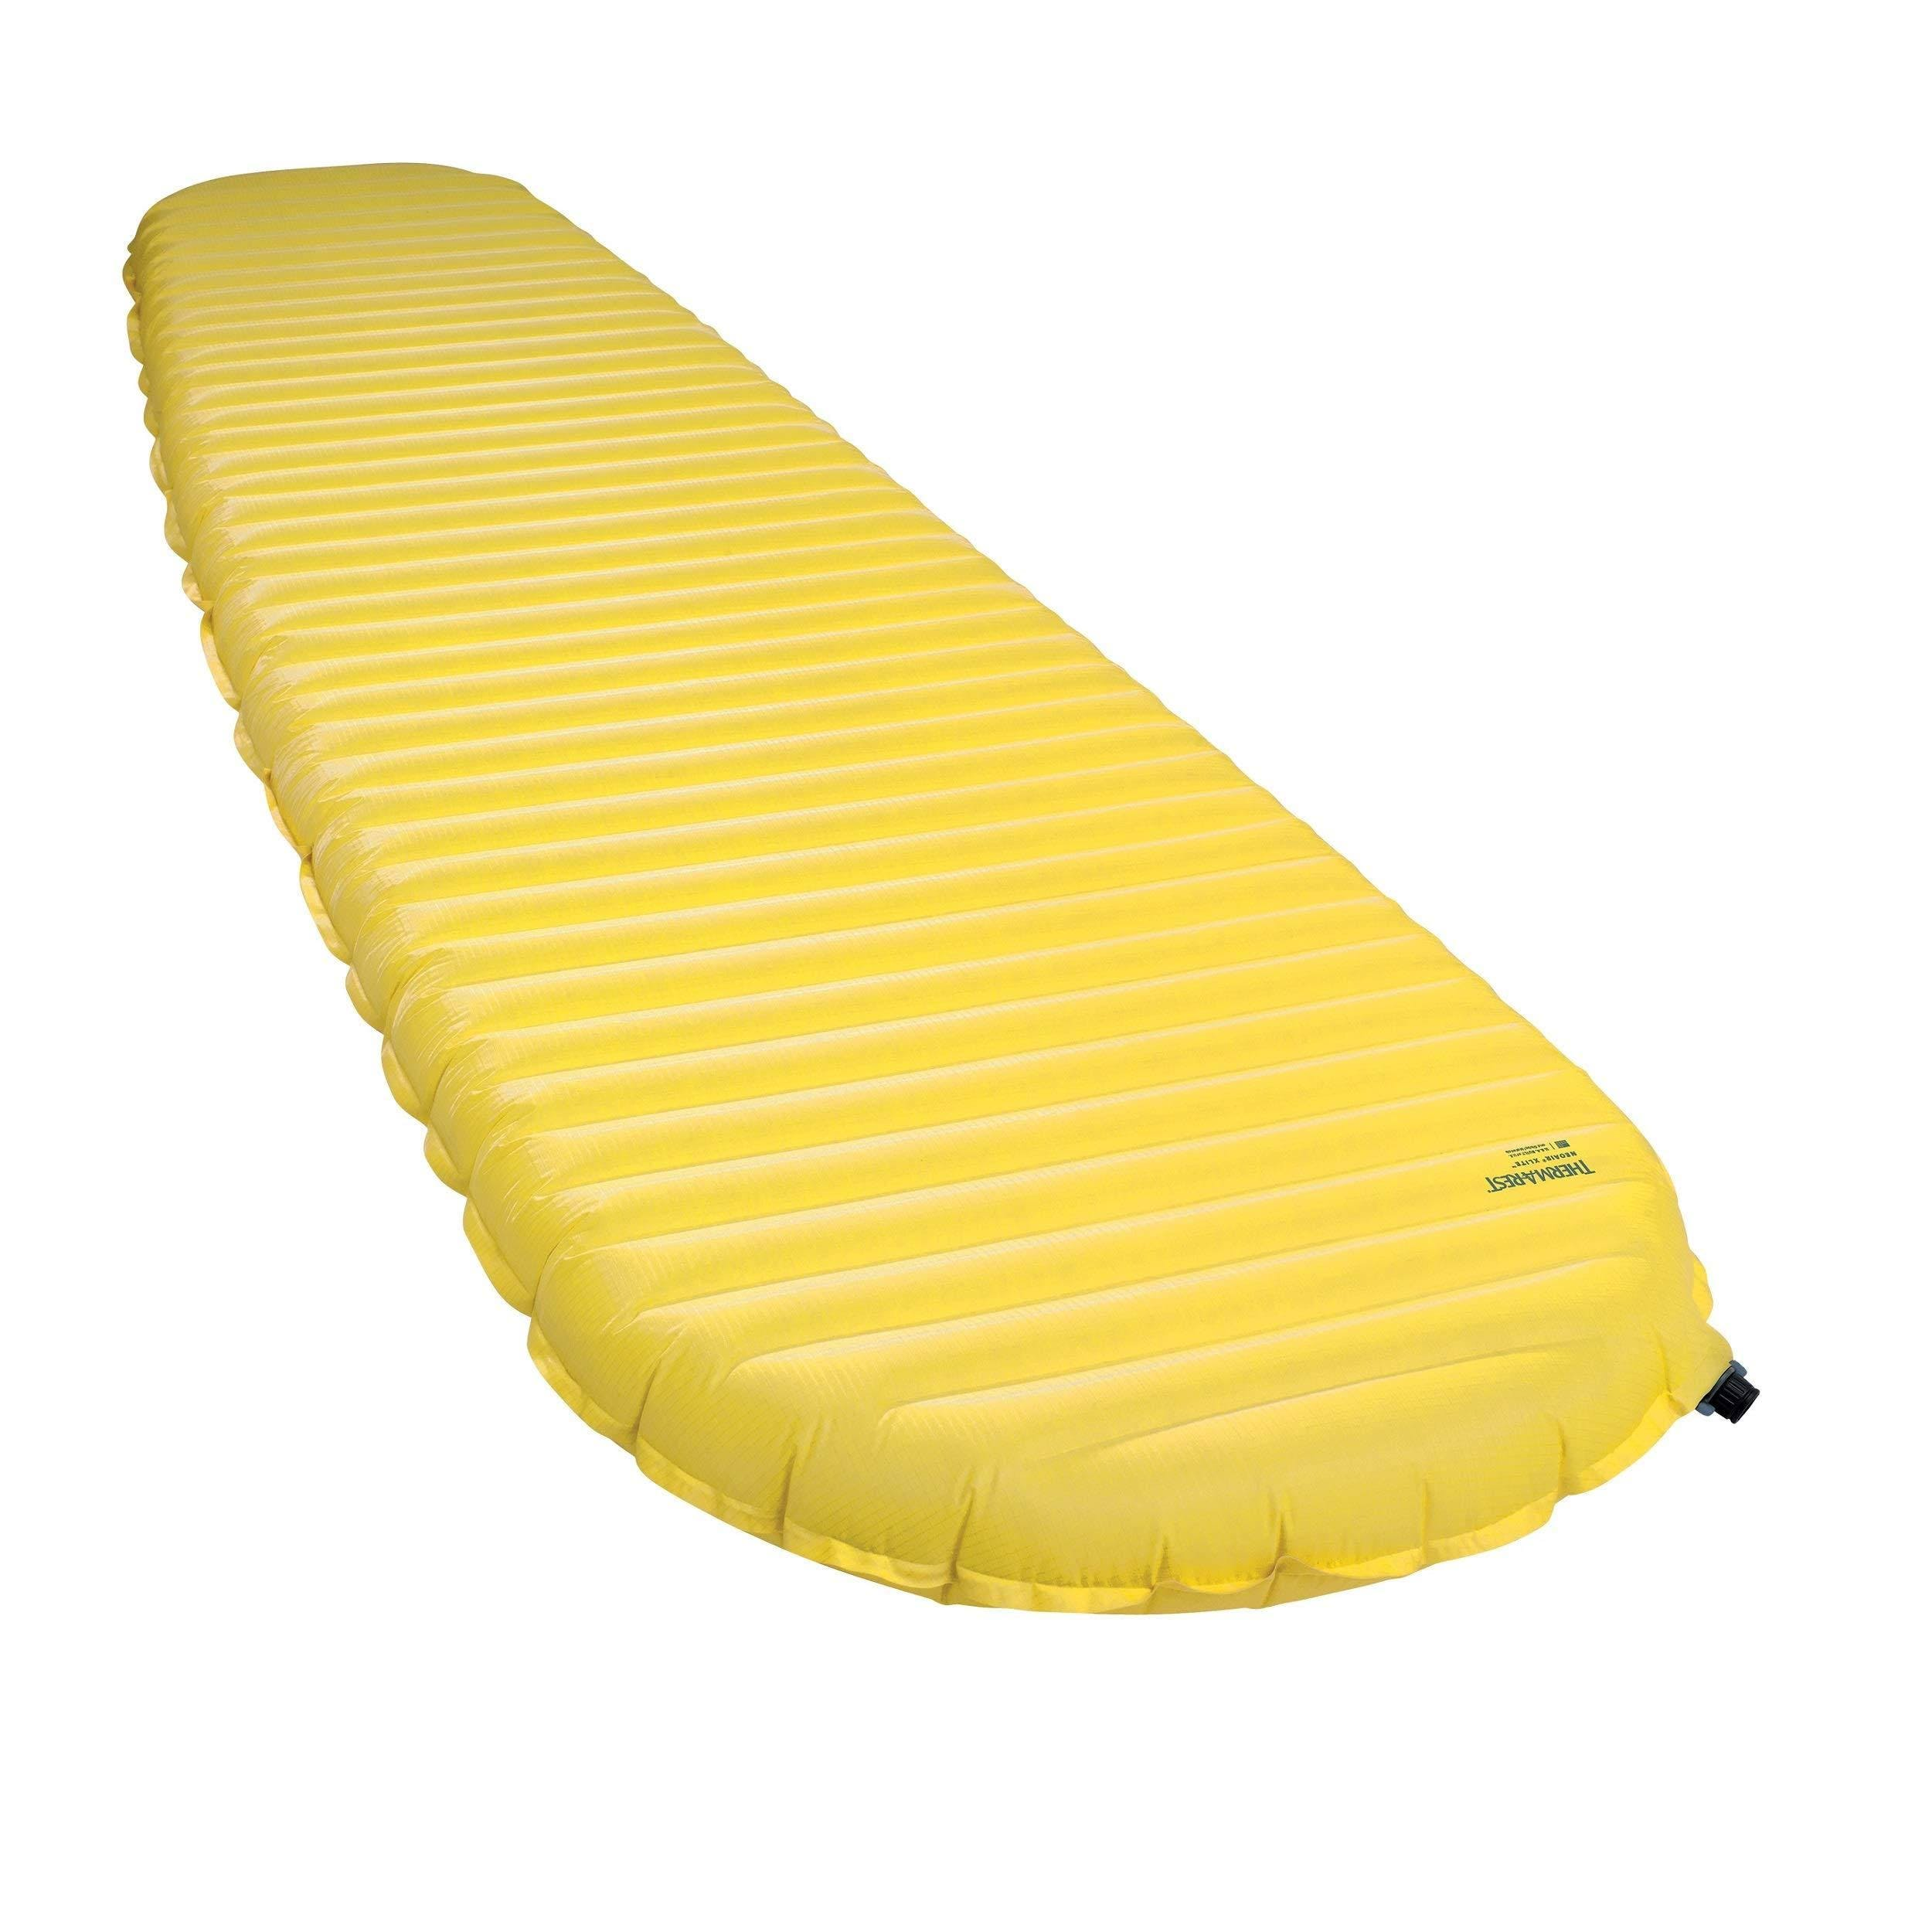 Therm-a-Rest NeoAir Xlite Sleeping Pad - Women's